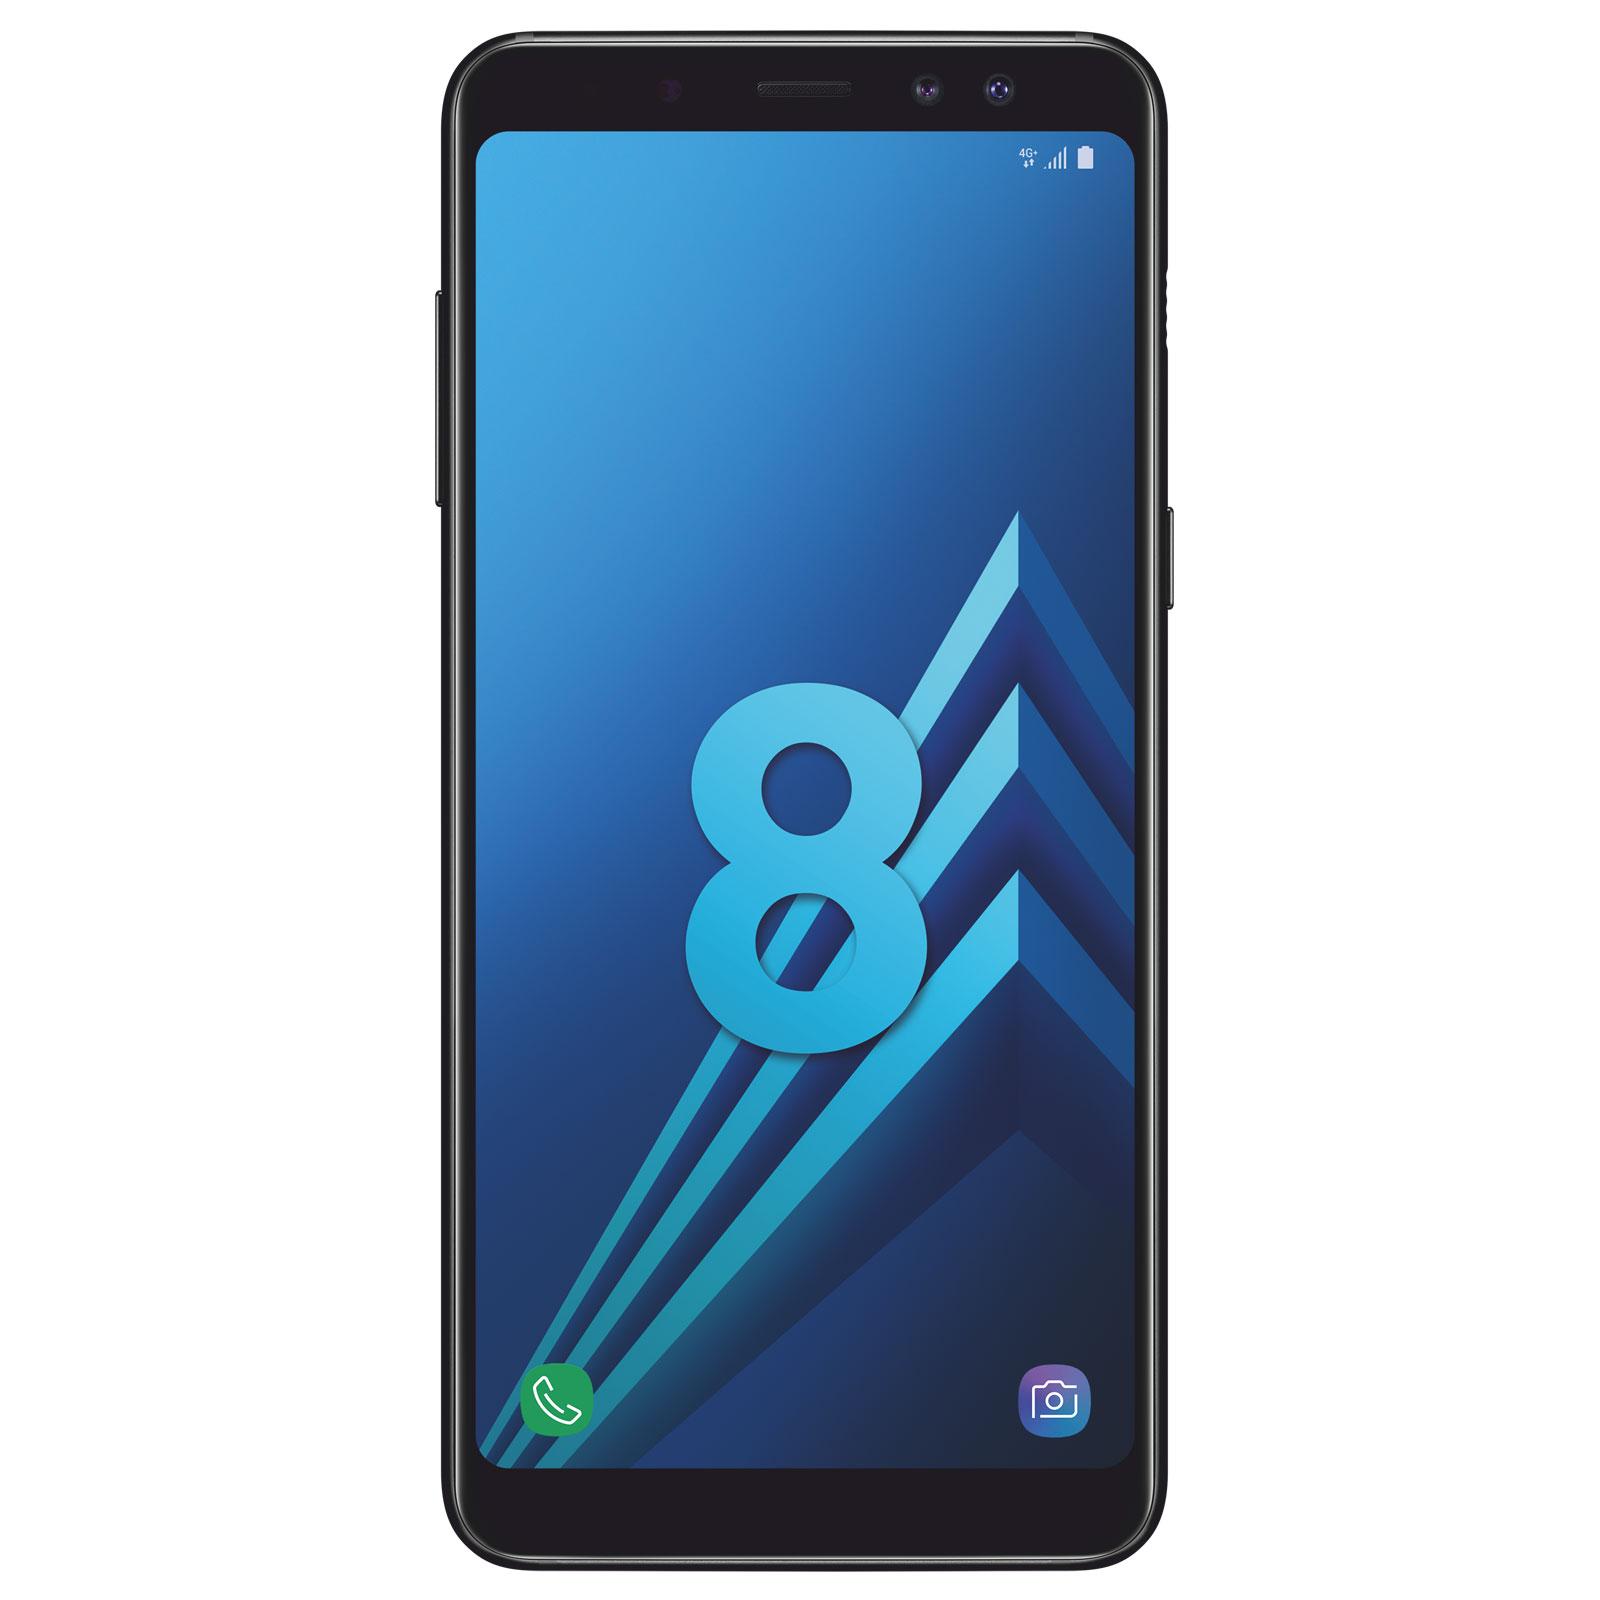 Samsung Galaxy A8 A530 32Go Noir Dual Sim (SM-A530FZKDXEF) - Achat / Vente Téléphonie sur Cybertek.fr - 0